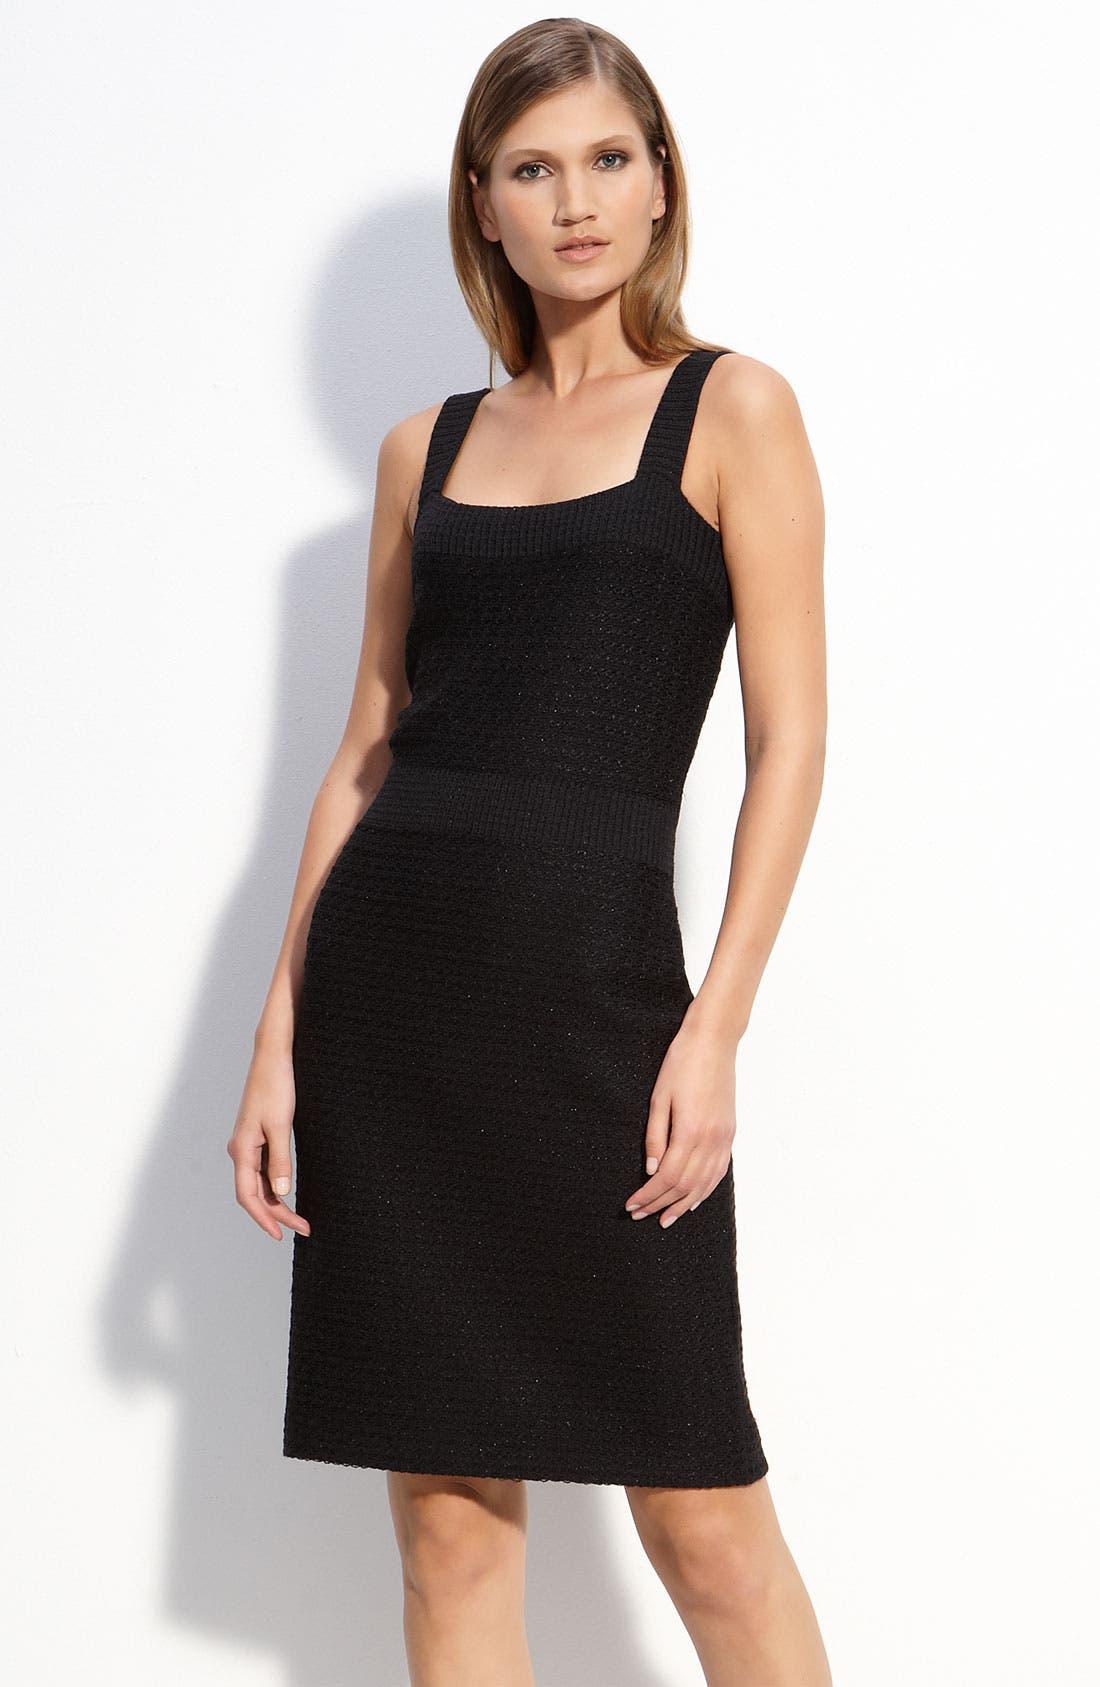 Alternate Image 1 Selected - St. John Collection Sparkle Knit Dress